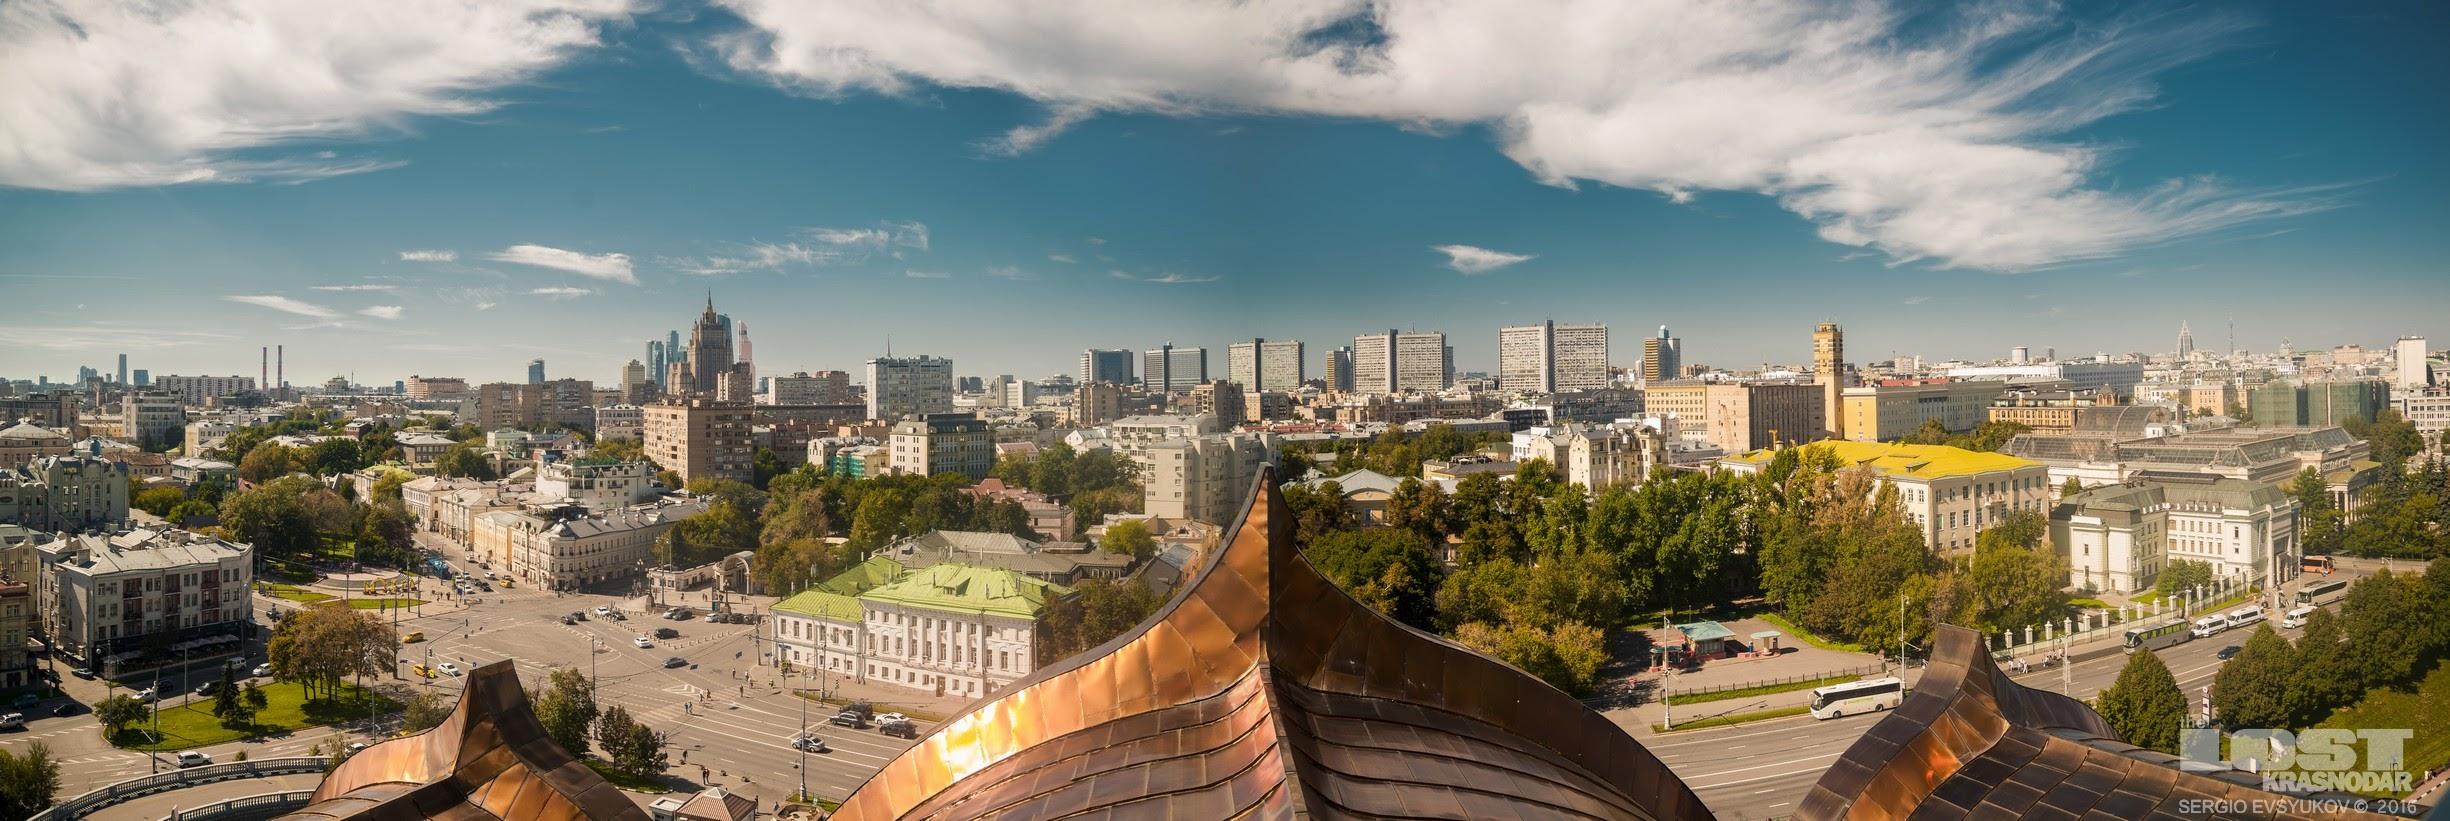 Панорама со смотровой храма Христа Спасителя